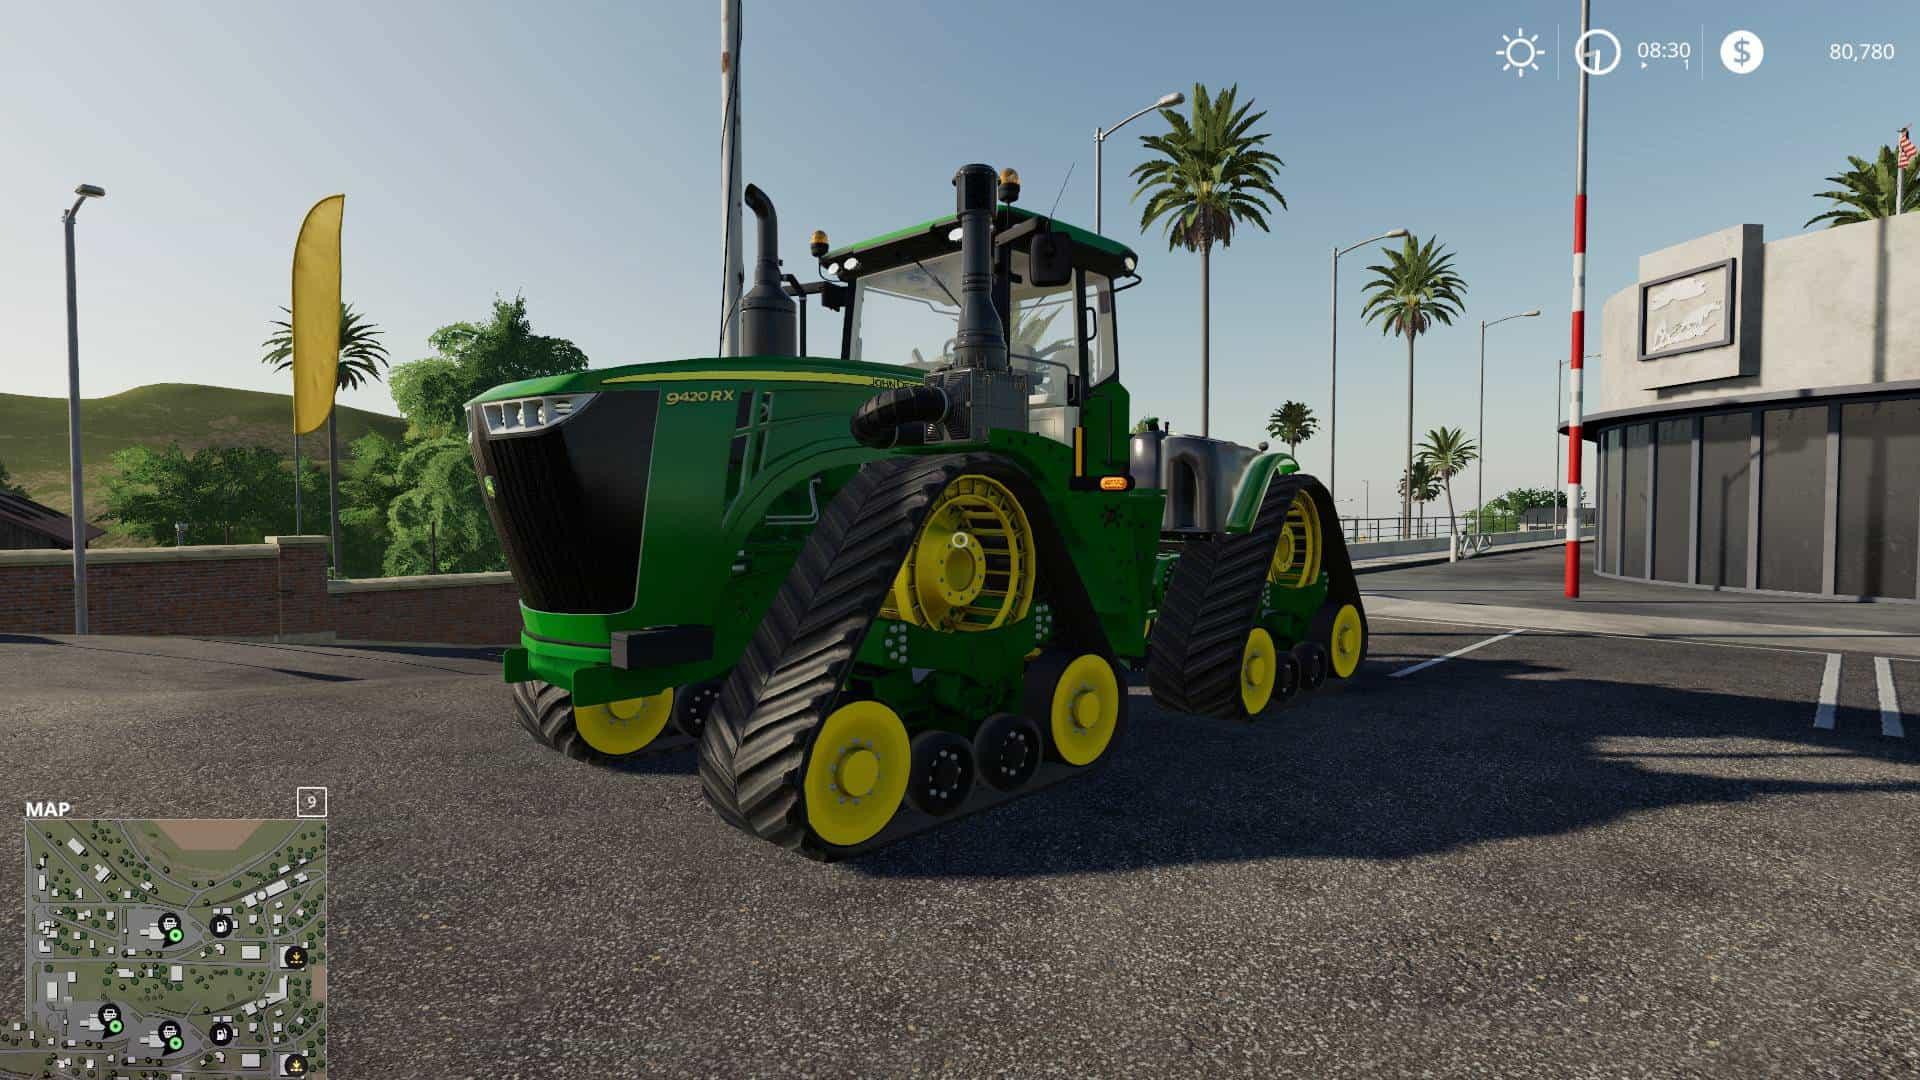 John Deere 9RX Tractor - Farming Simulator 19 Mod / FS19